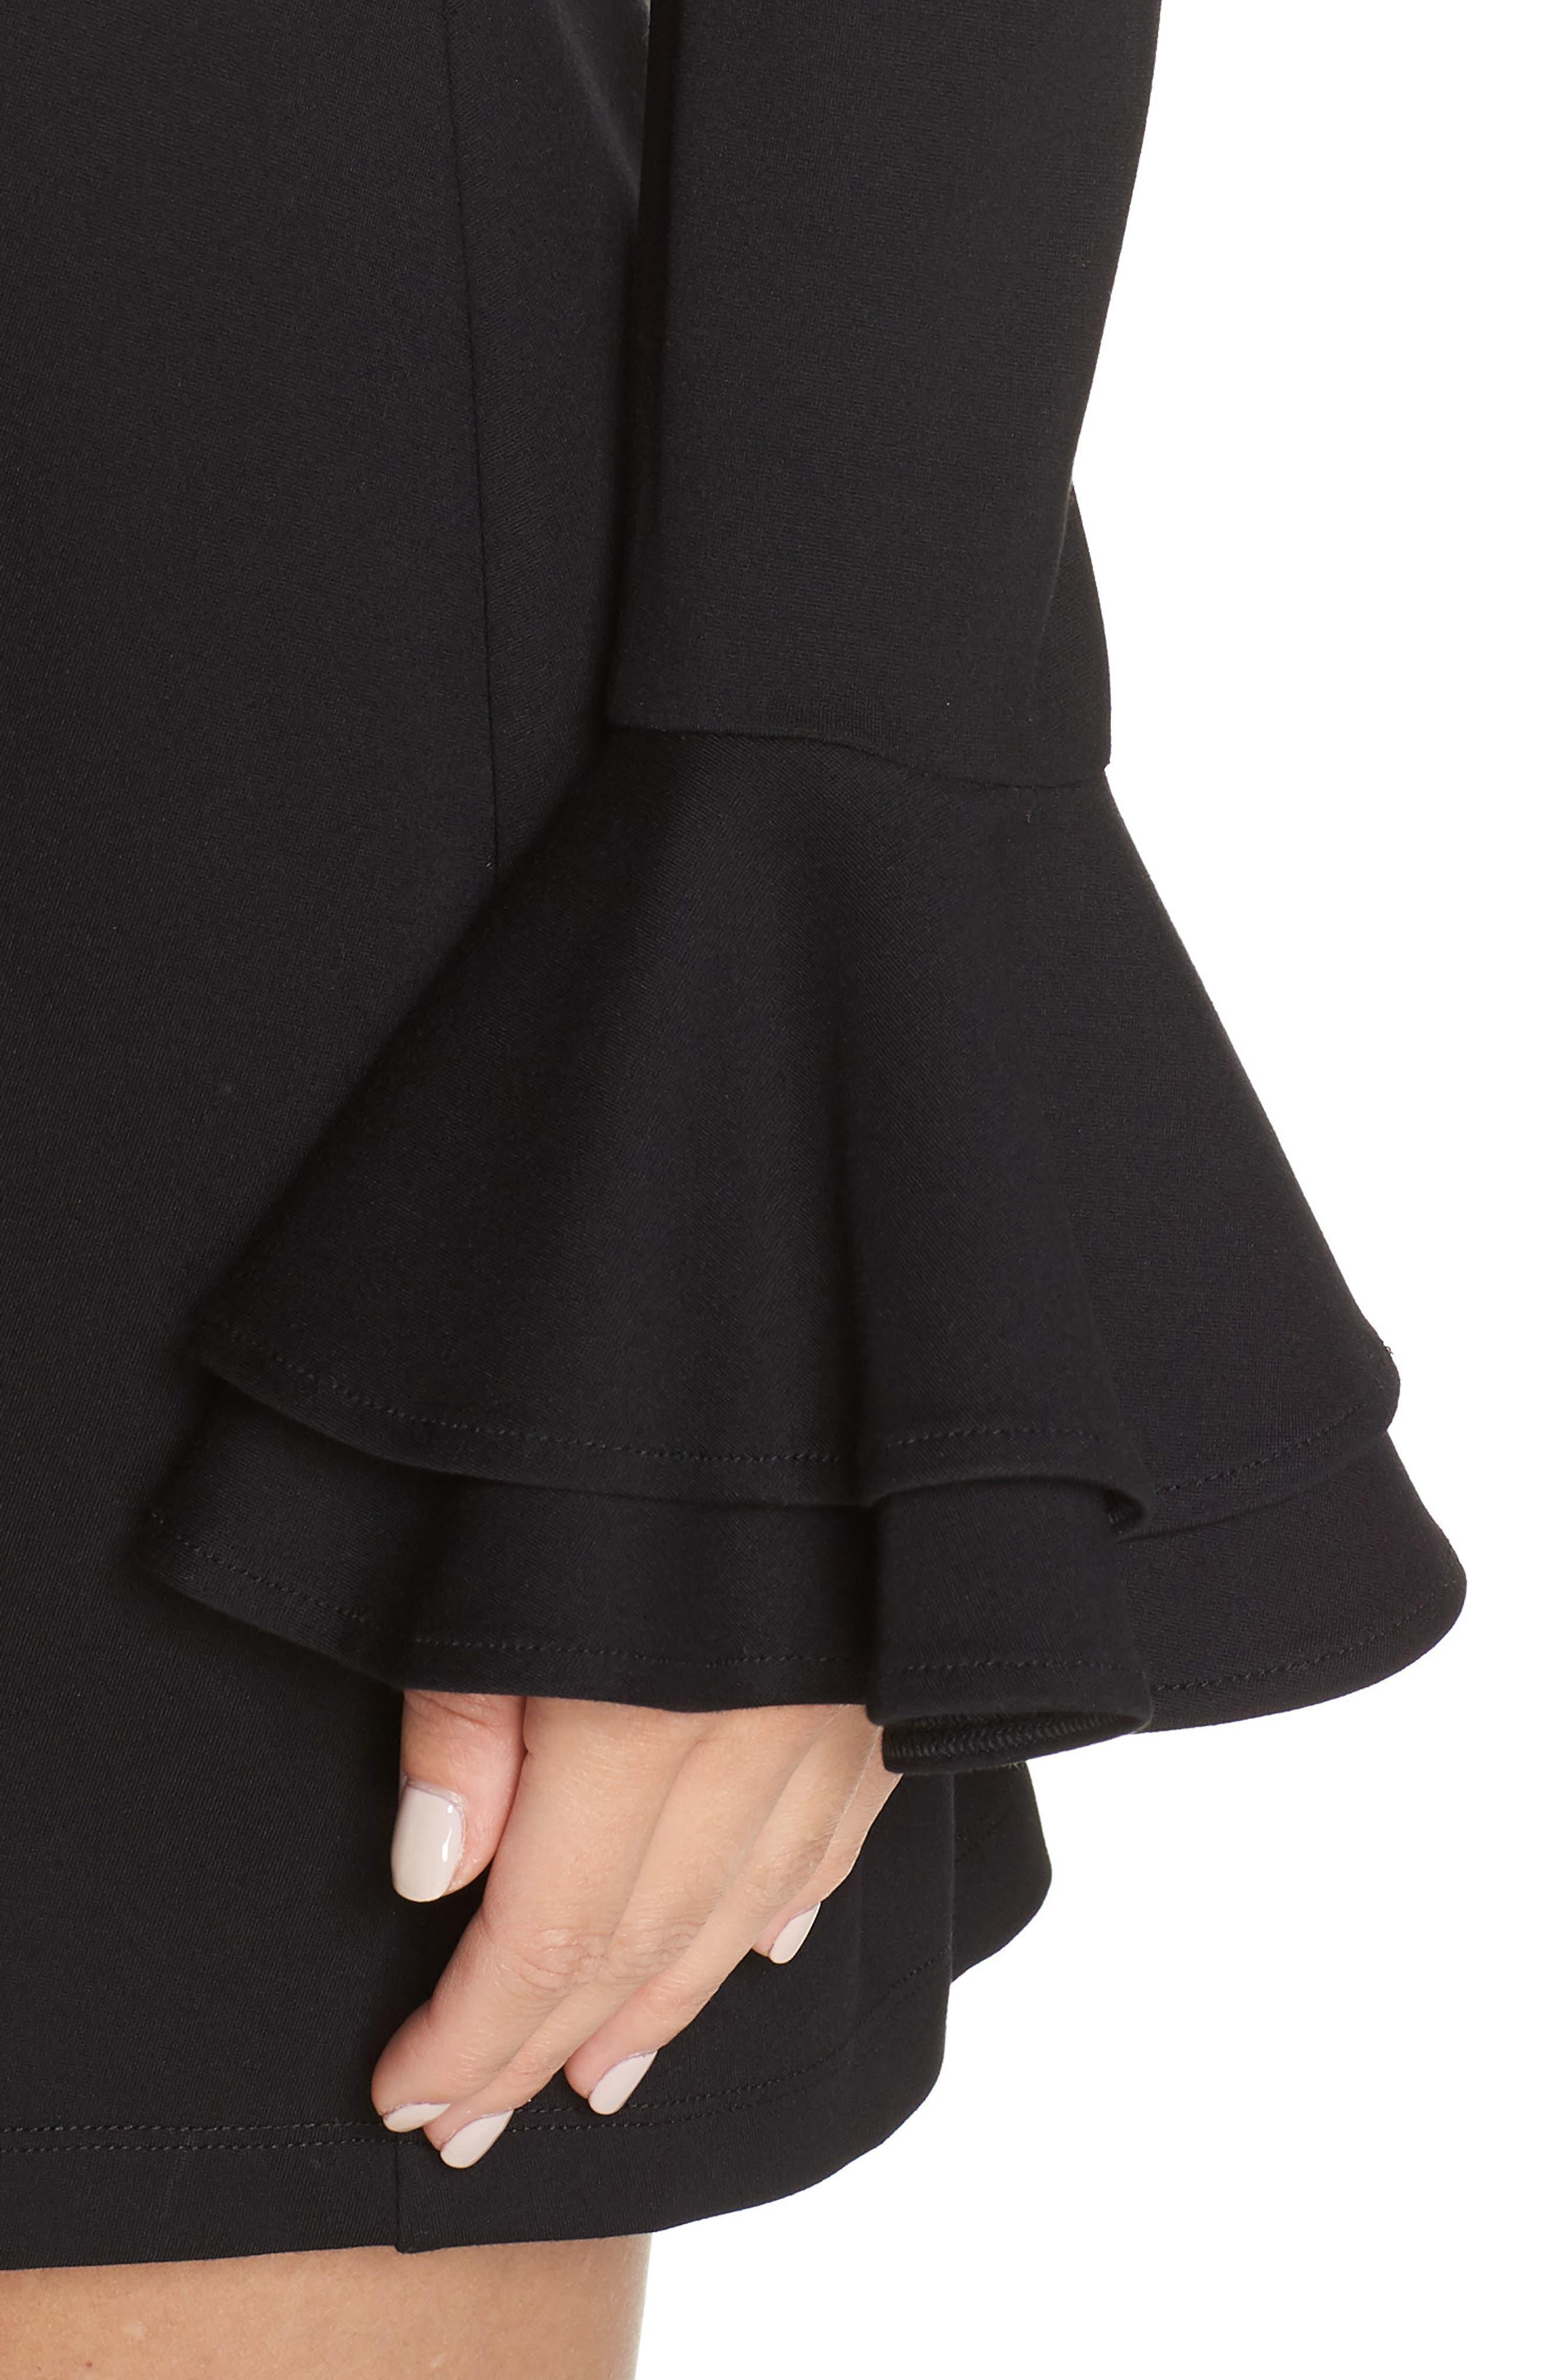 ALI & JAY, Still Waiting Fit & Flare Dress, Alternate thumbnail 5, color, BLACK